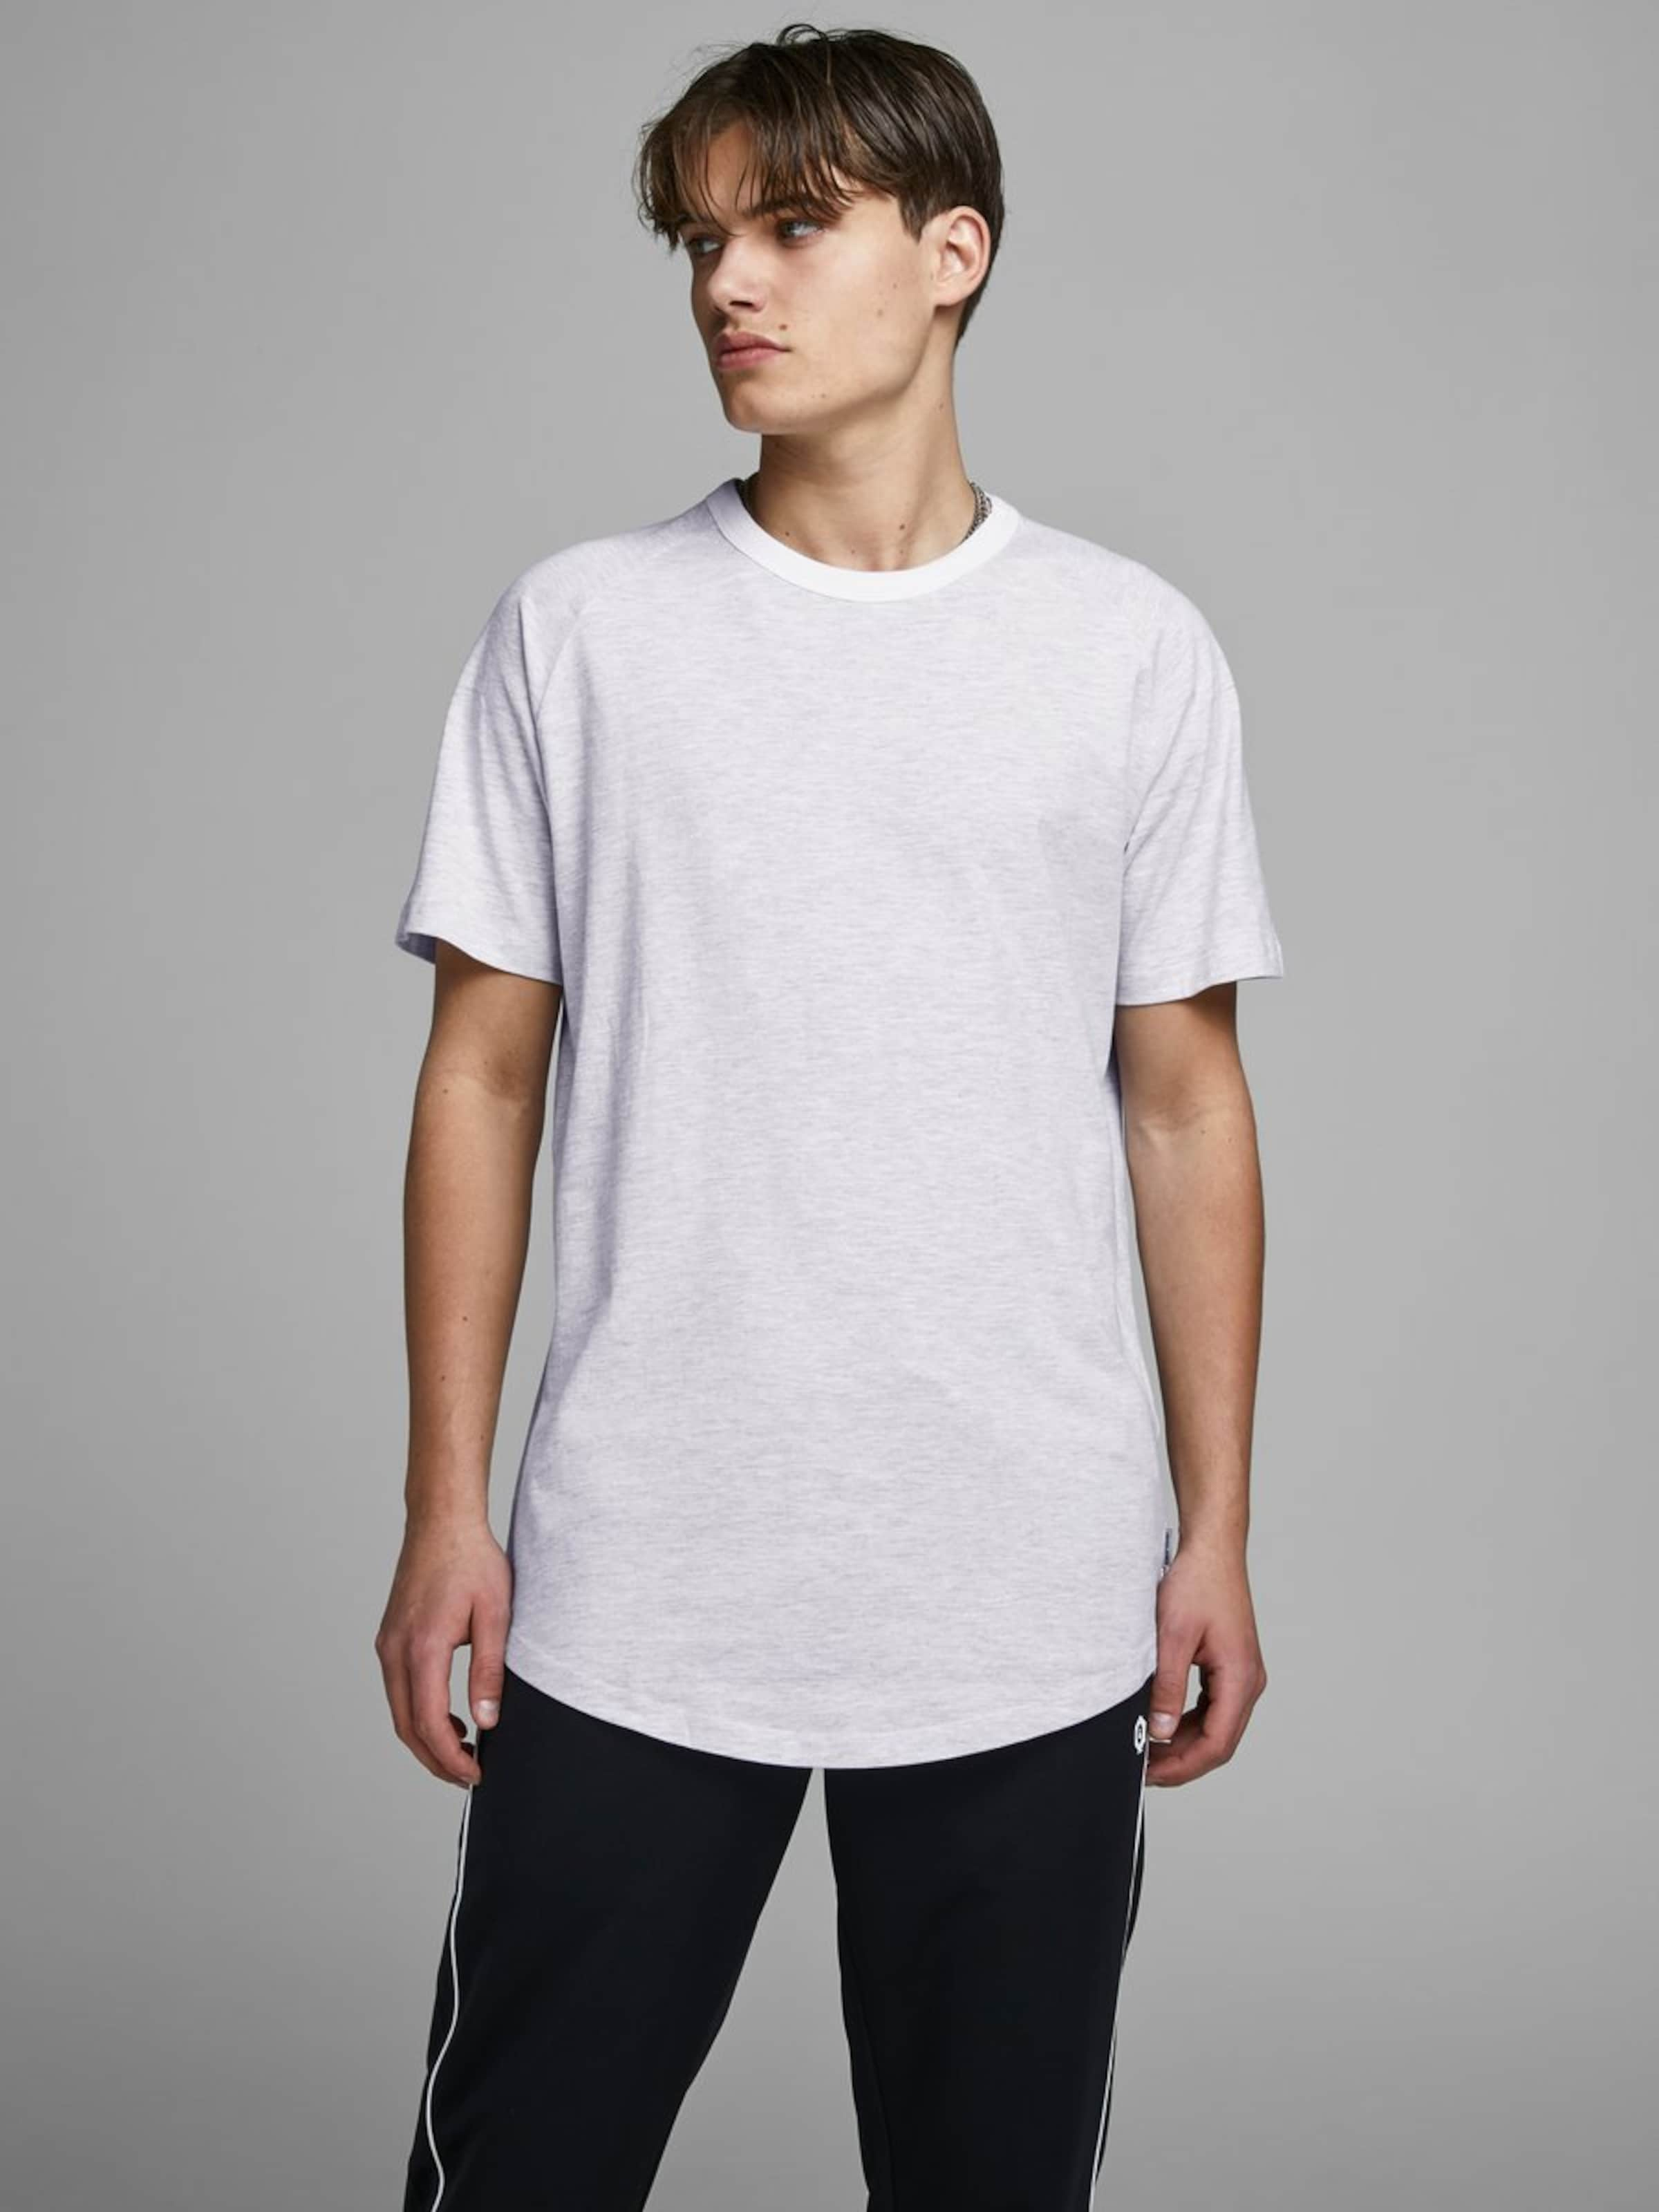 En Jones Jackamp; T shirt Marine I6Ygyvbfm7